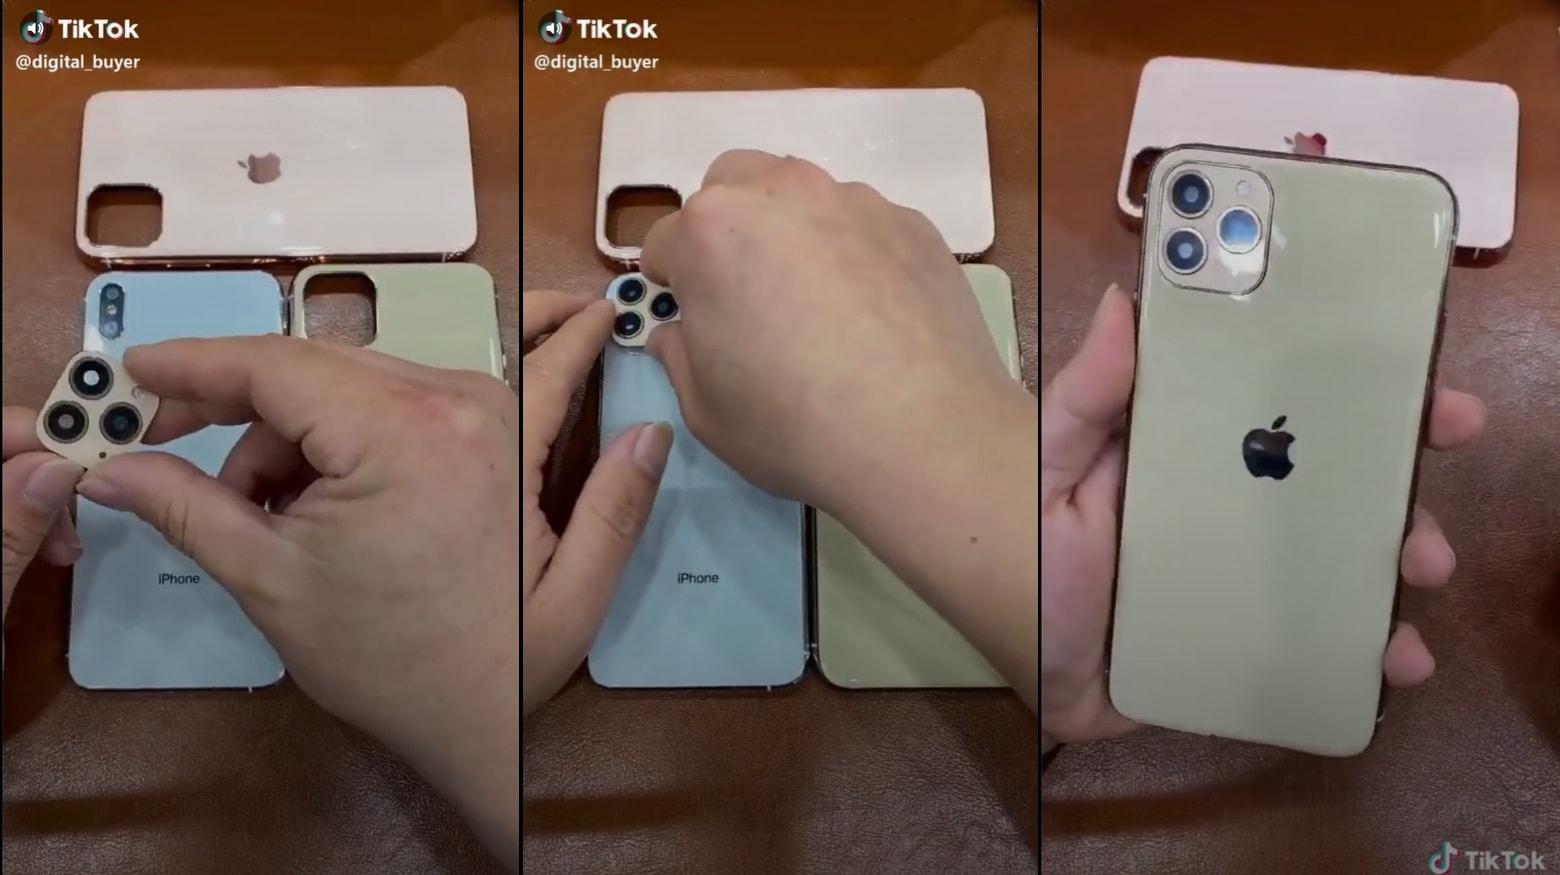 iPhone XS case simulates iPhone 11 Pro